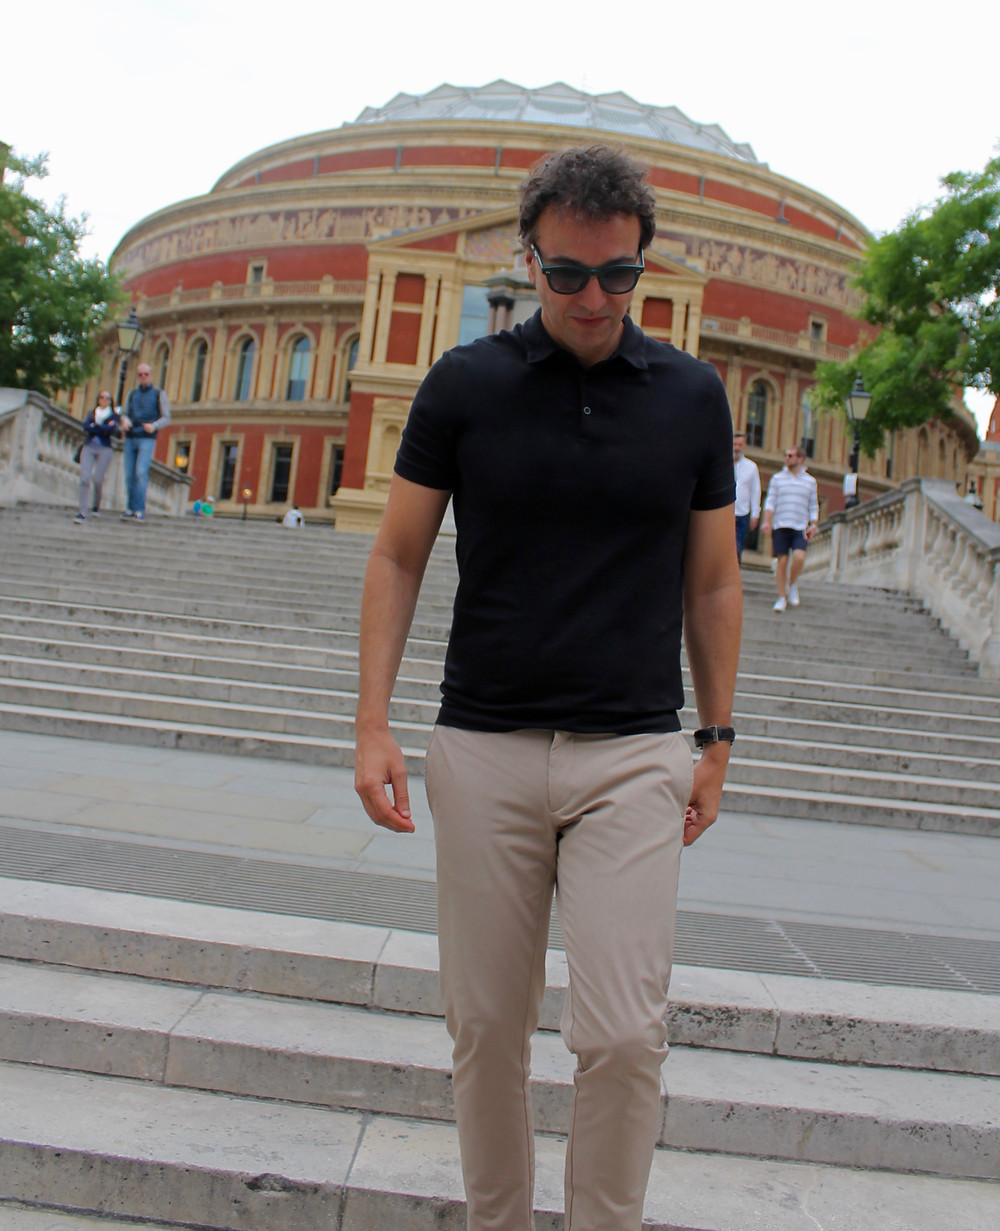 The trendy man in London